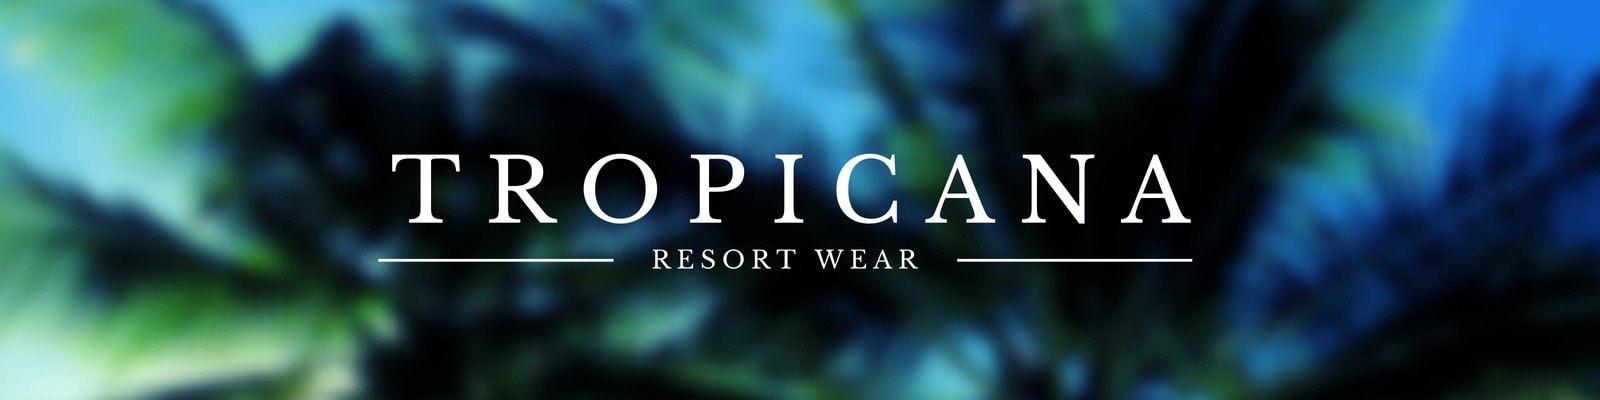 Tropical Wear Etsy Banner